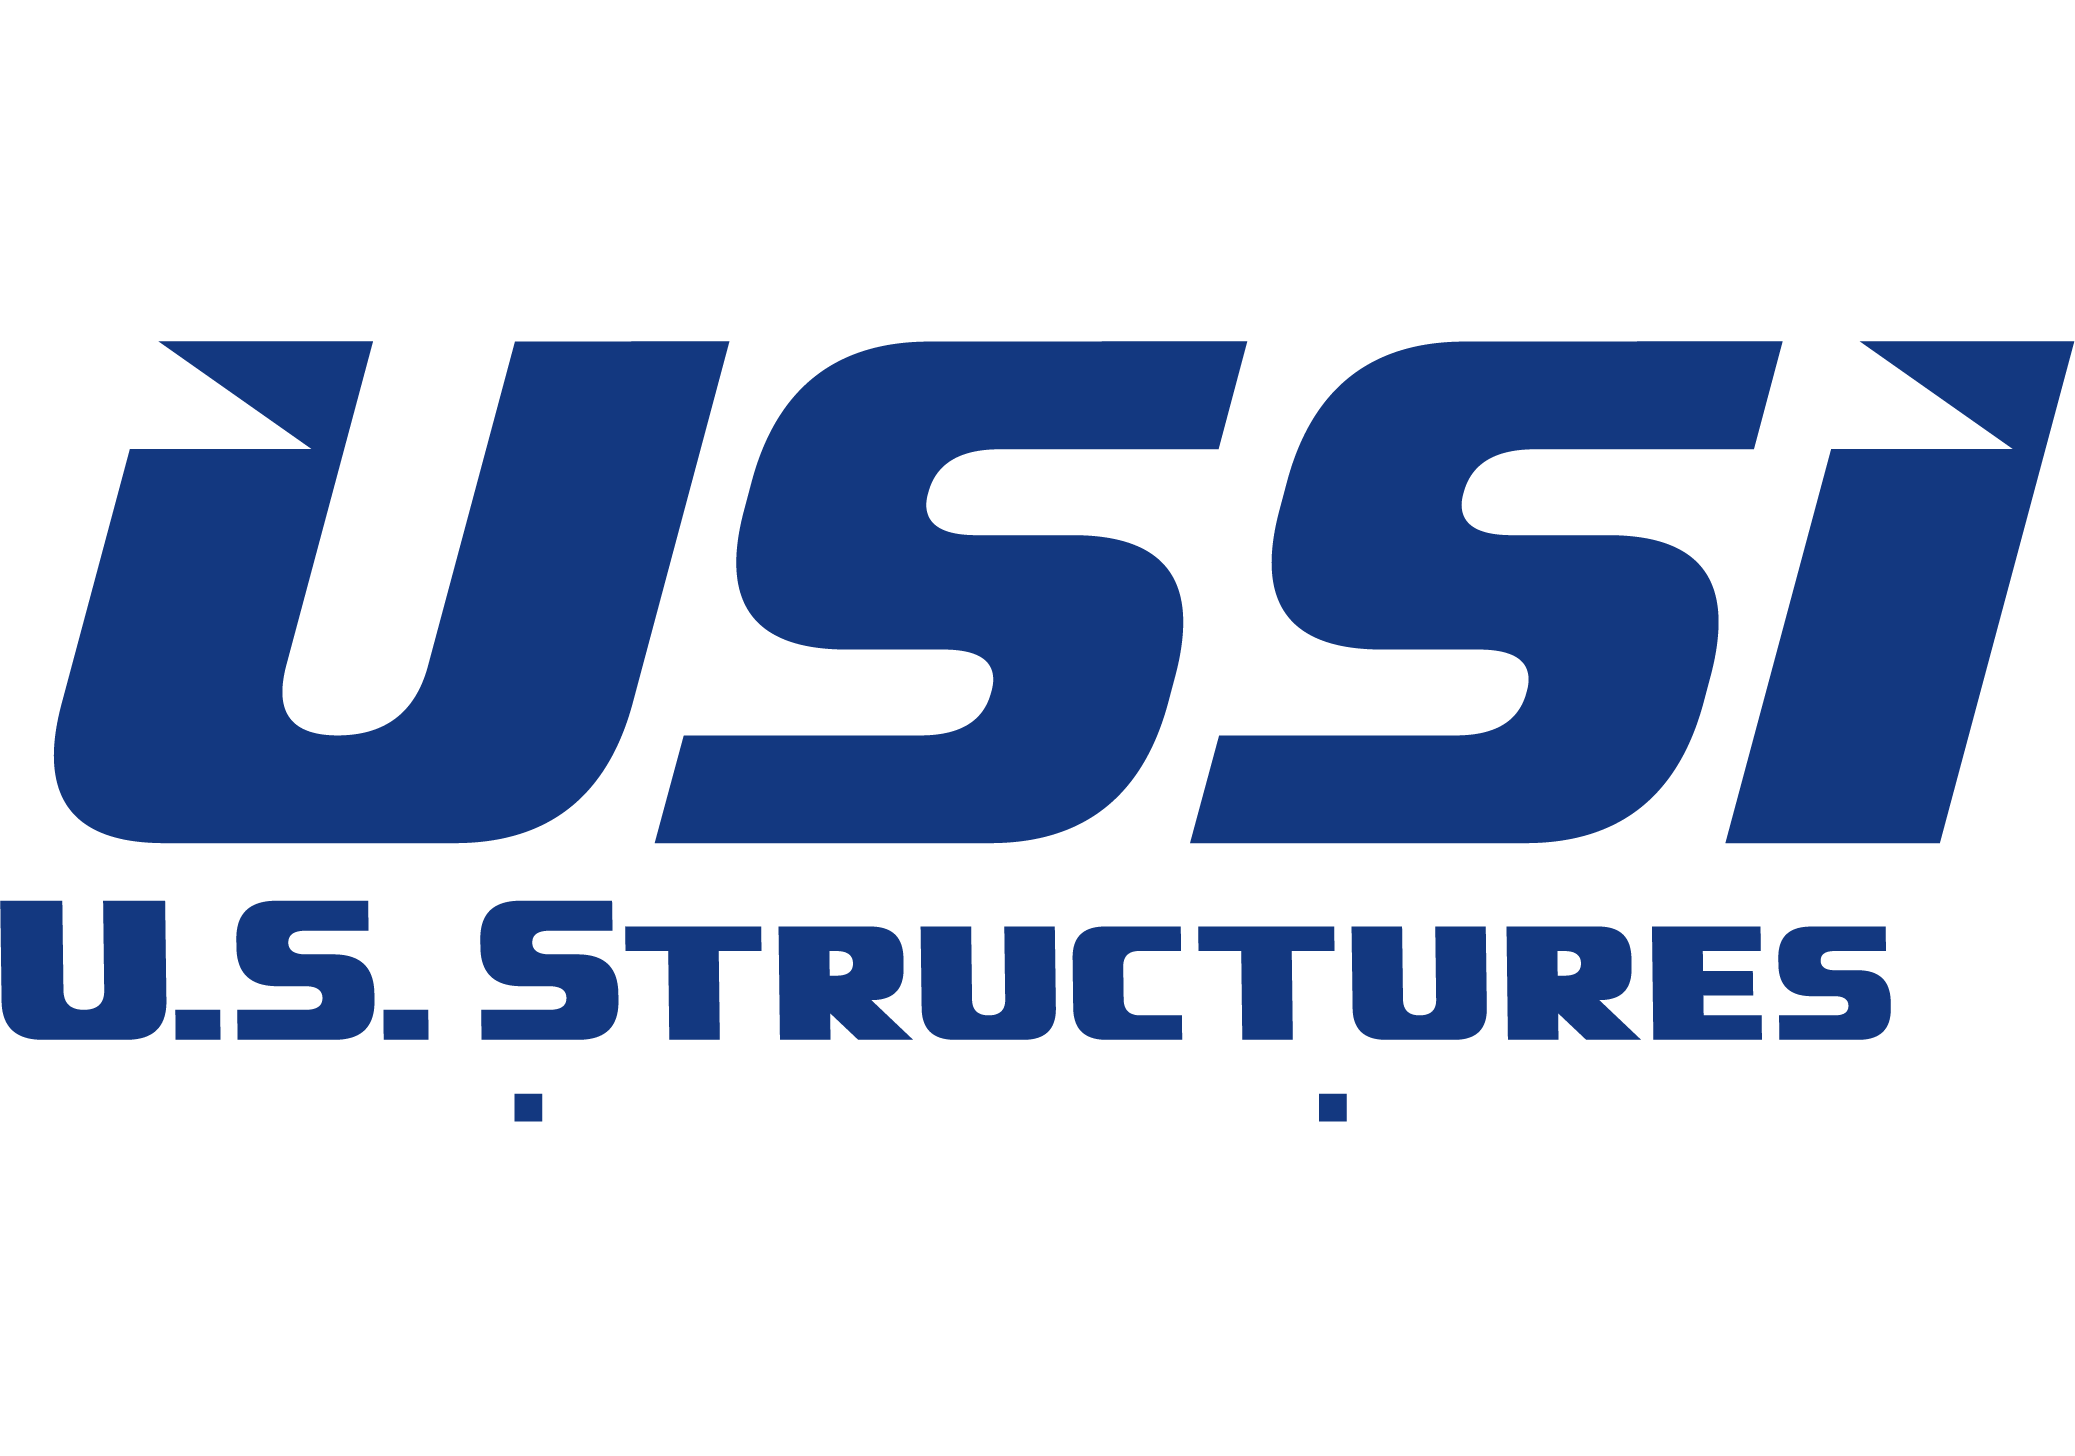 U.S. Structures Inc.